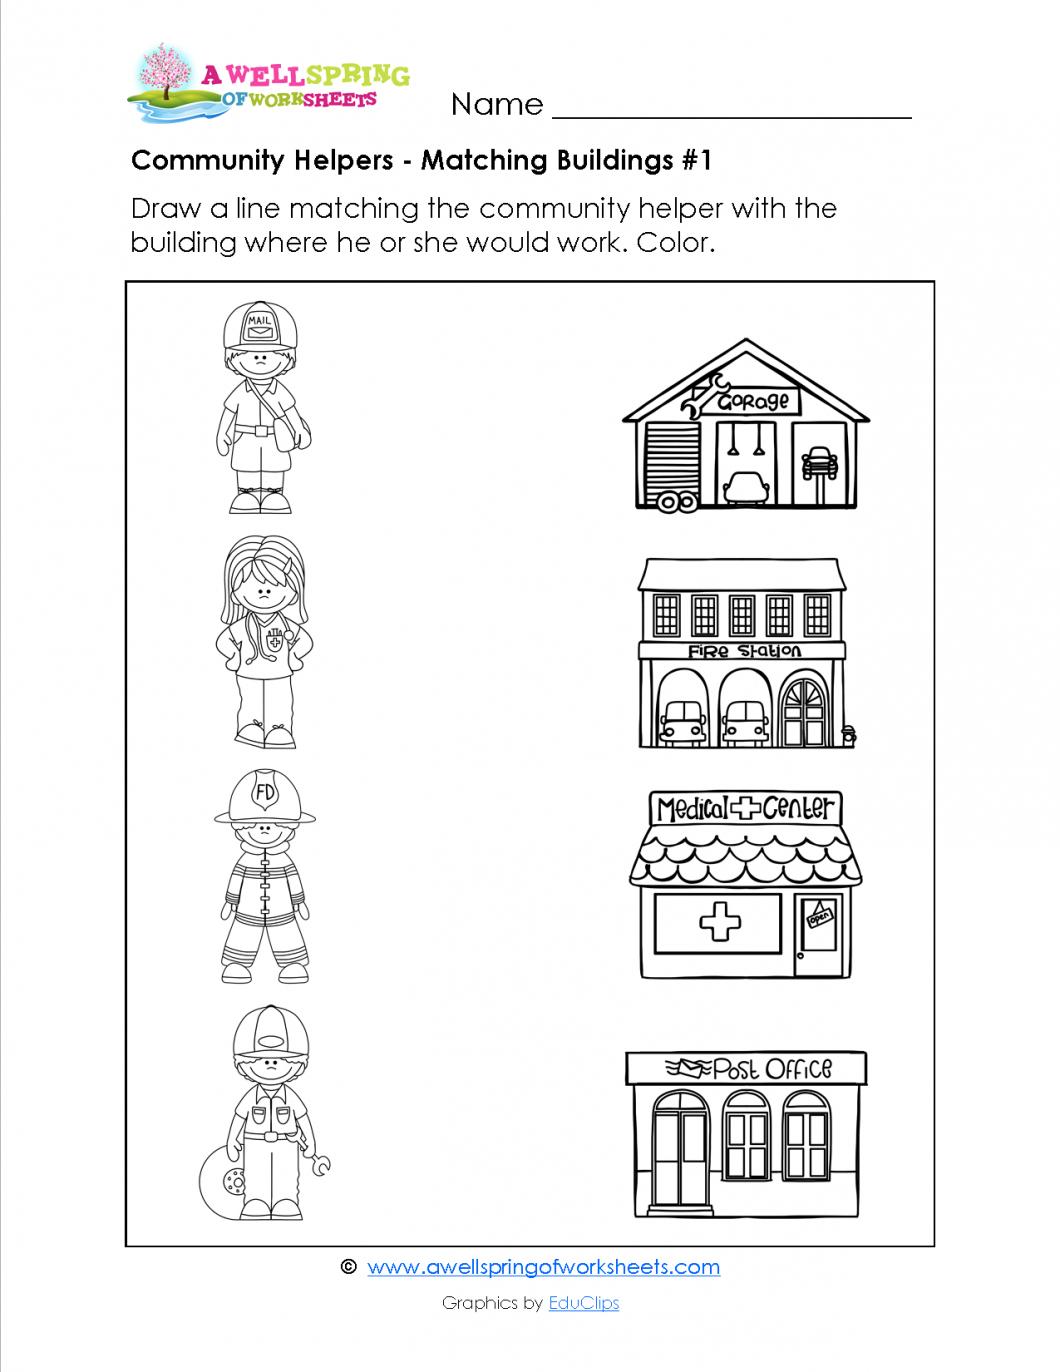 Fun Worksheets For Preschool – With Pre K Alphabet Printables Also | Free Printable Community Helpers Worksheets For Kindergarten